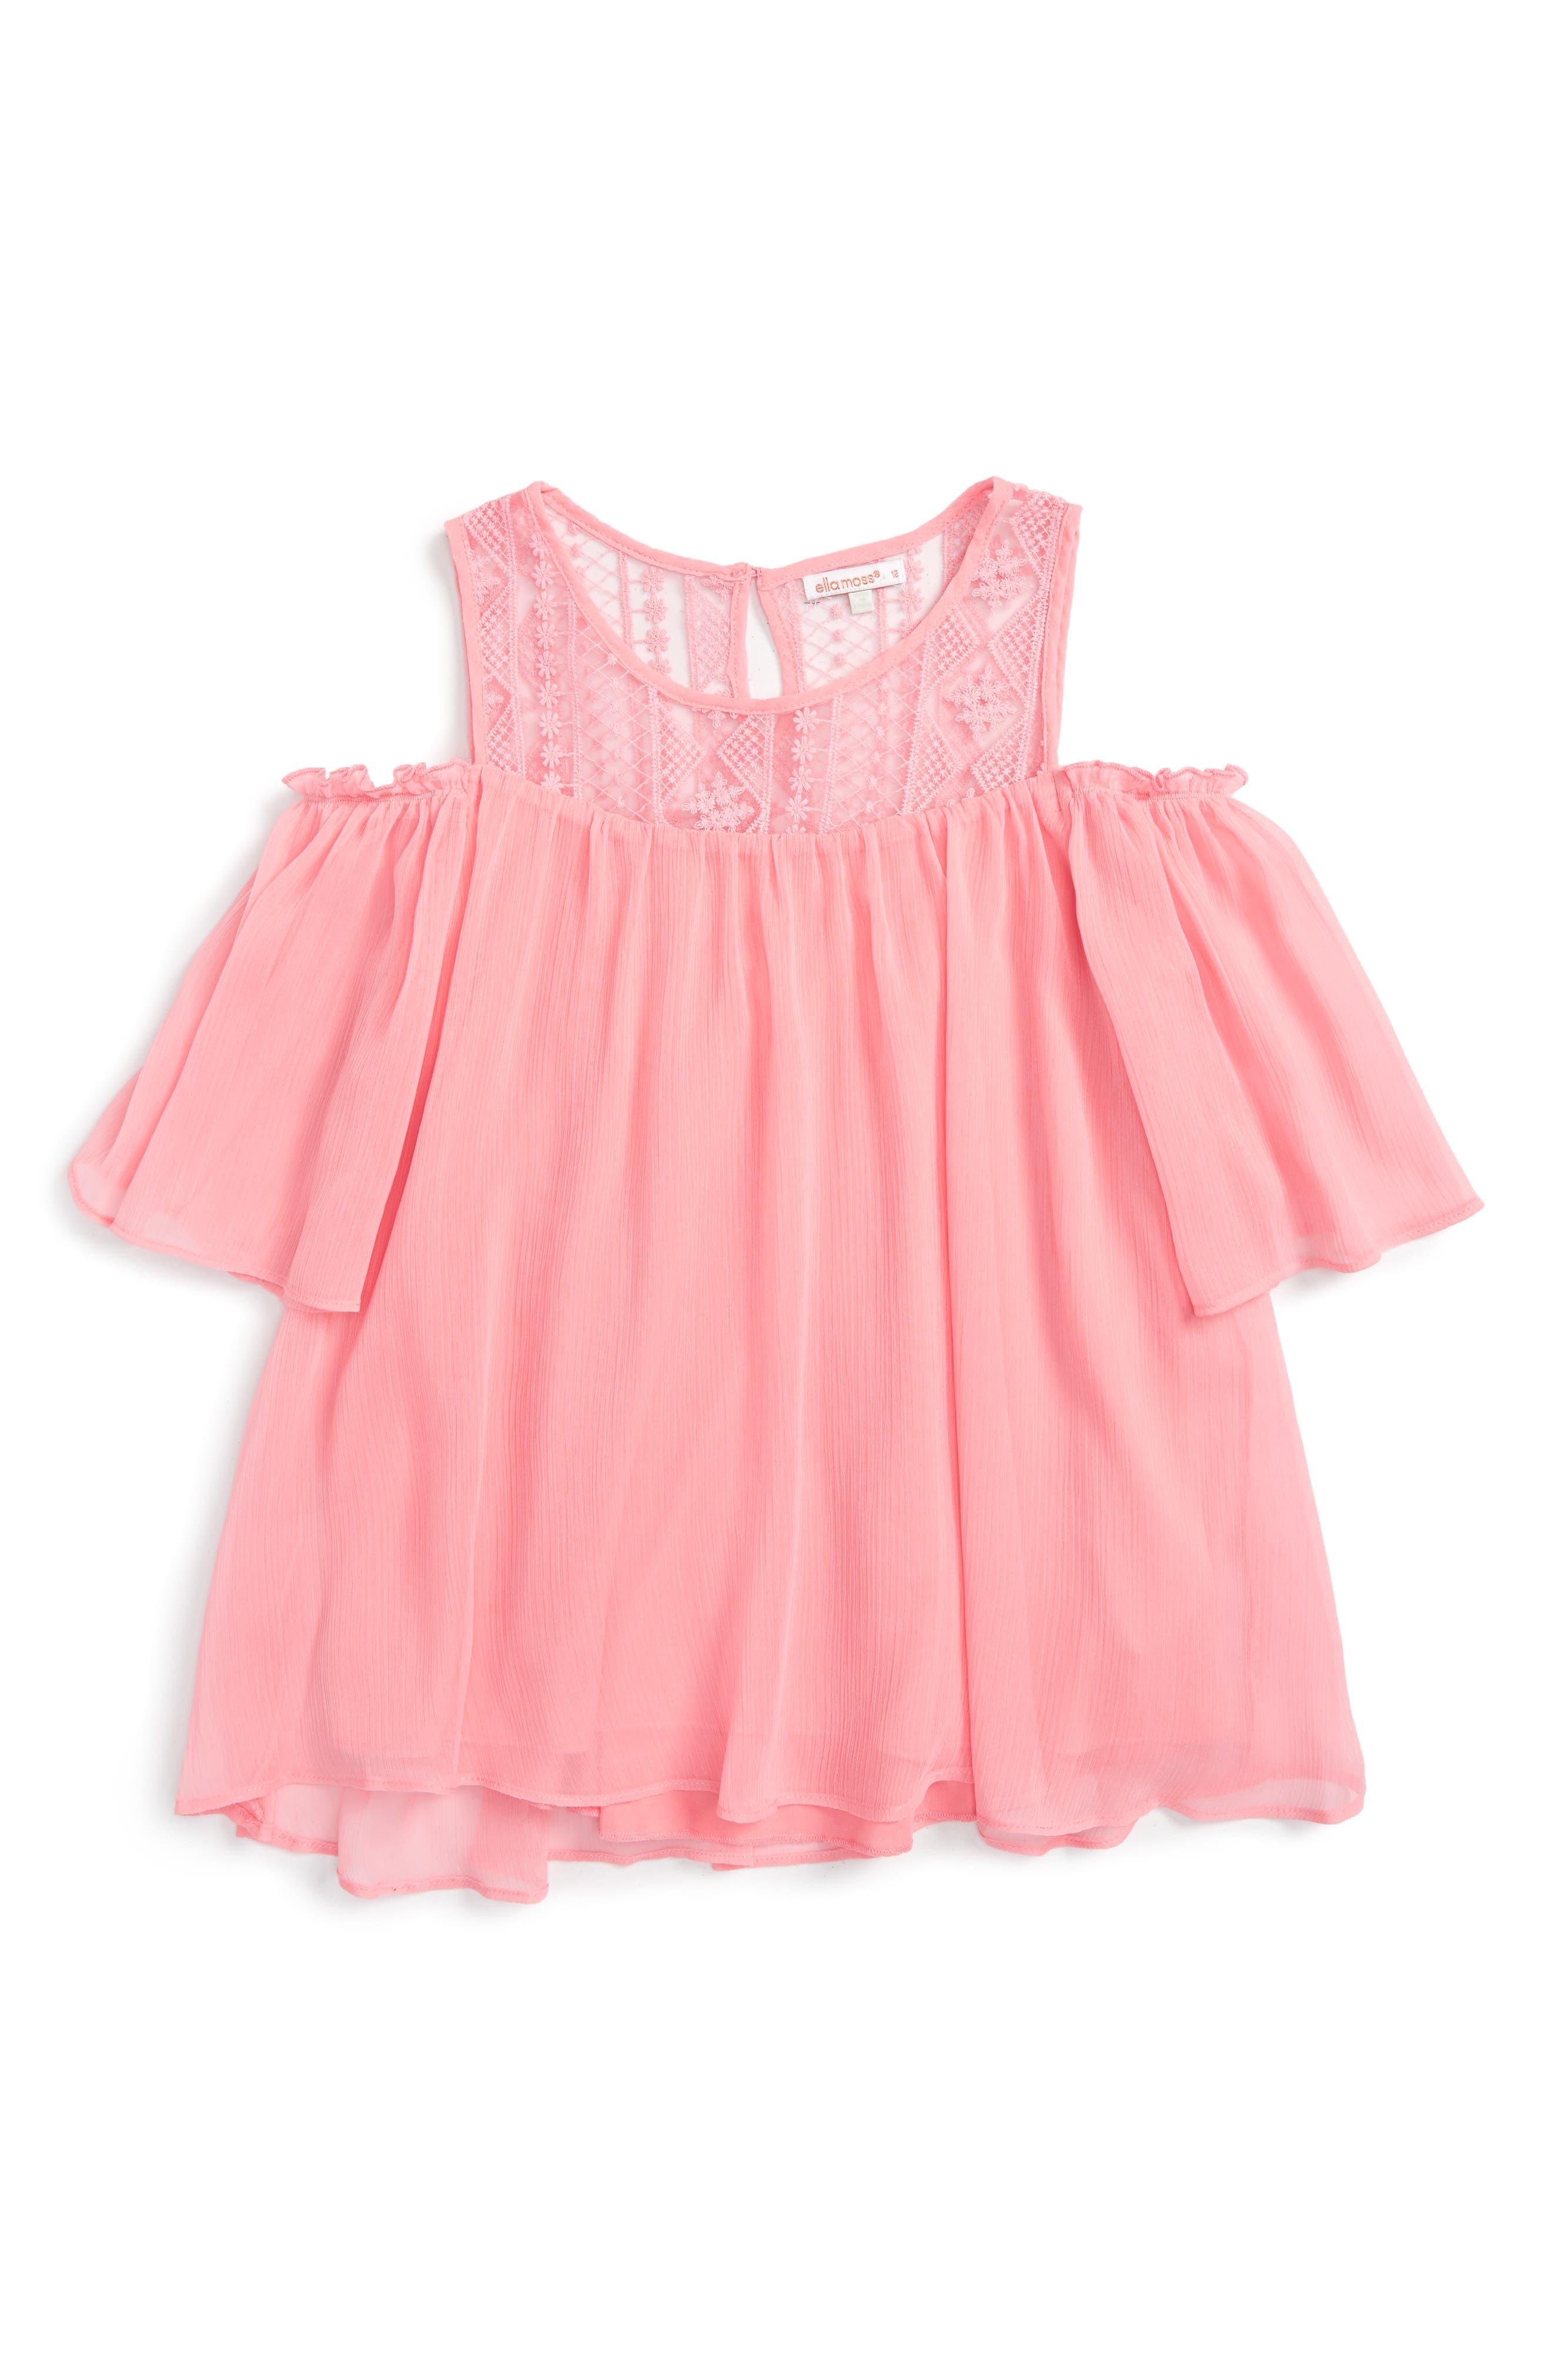 Haley Crochet Cold Shoulder Blouse,                         Main,                         color, Pink